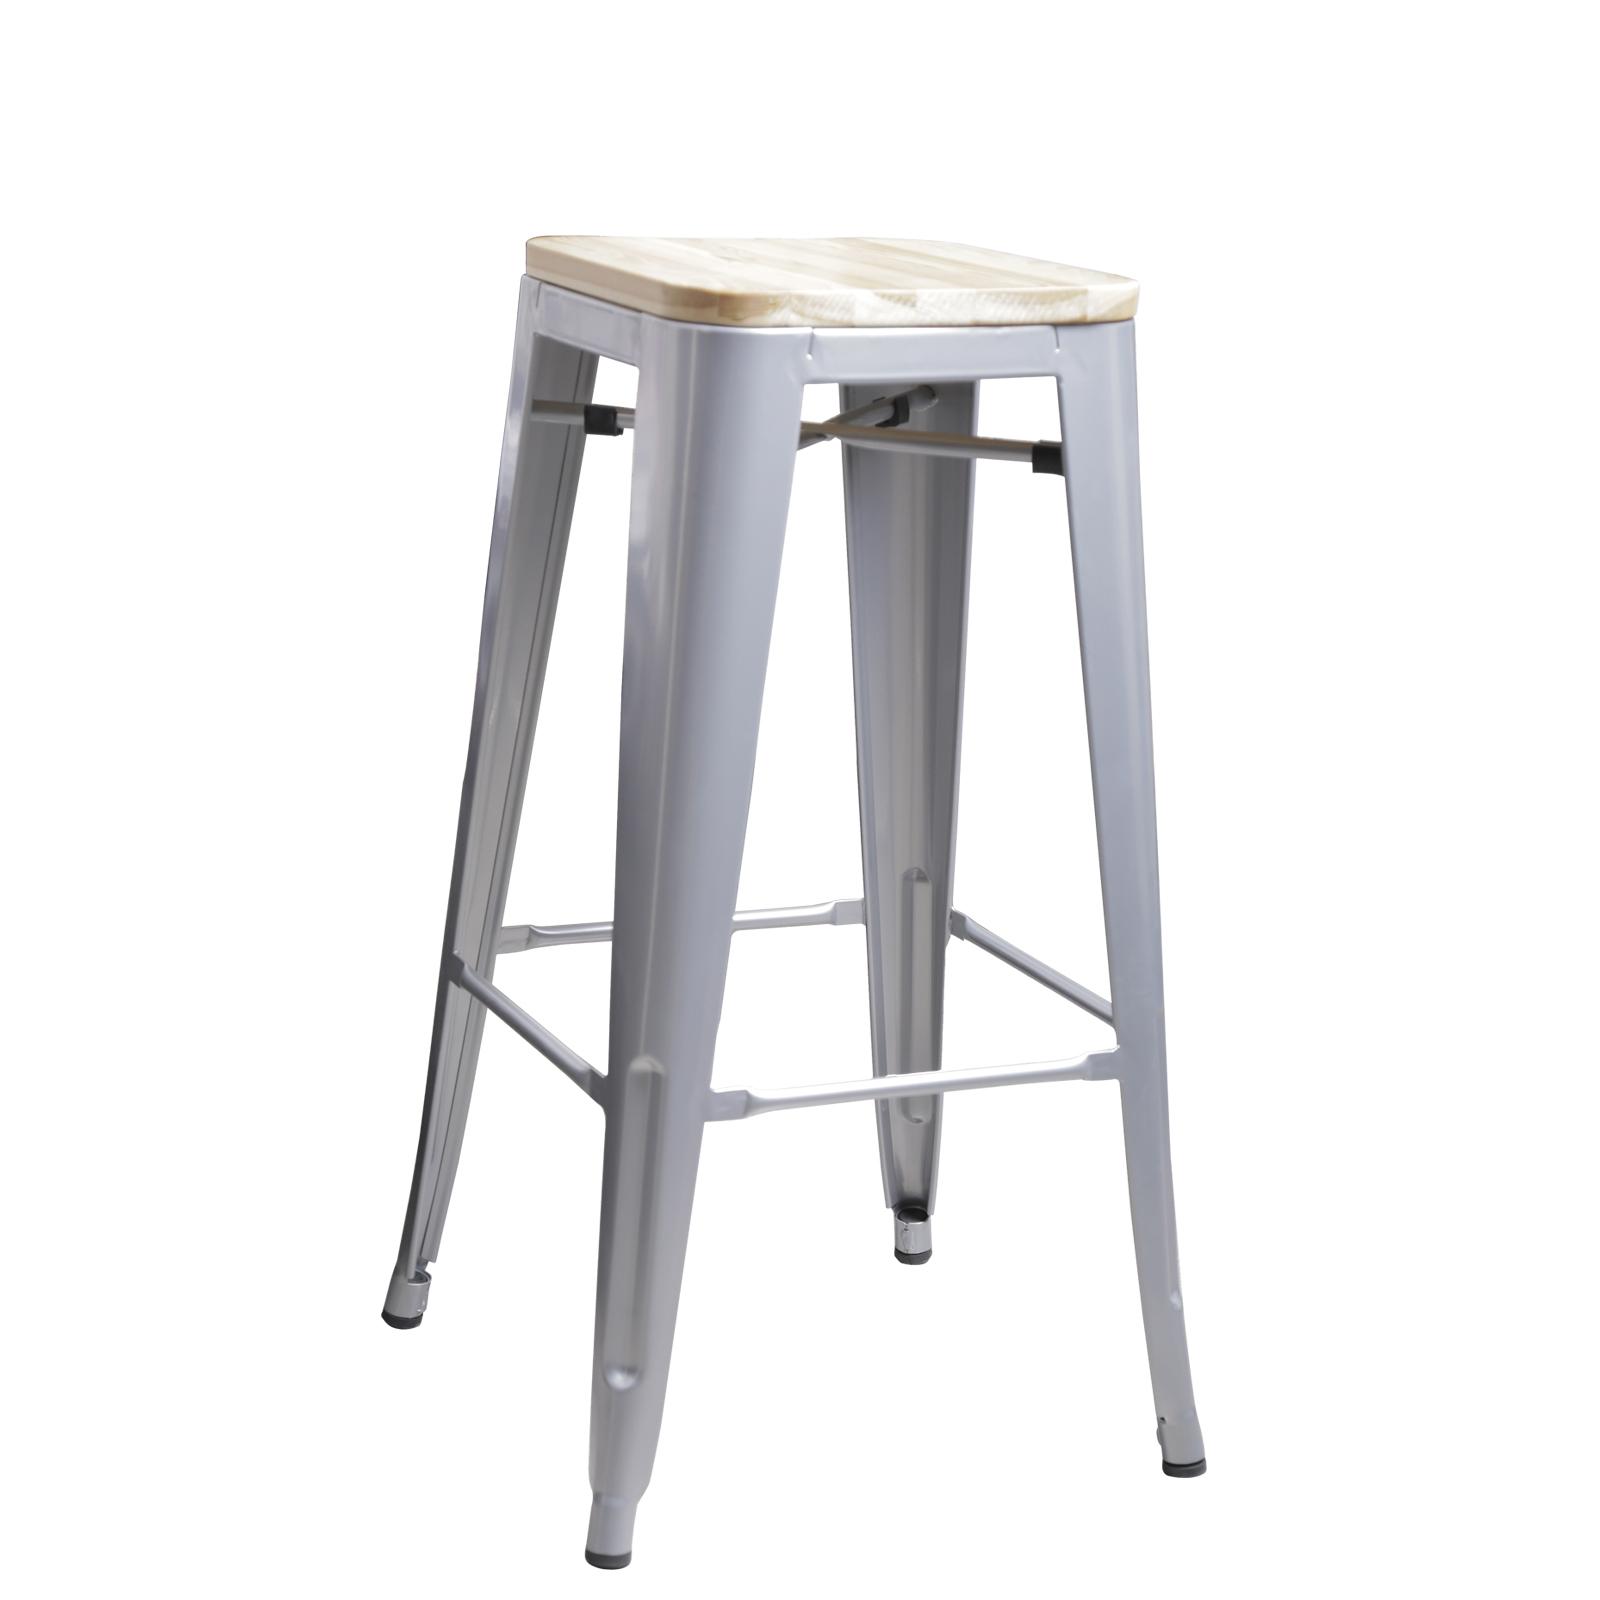 4 x replica new tolix bar stool xavier metal steel with - Tolix bar stool replica ...